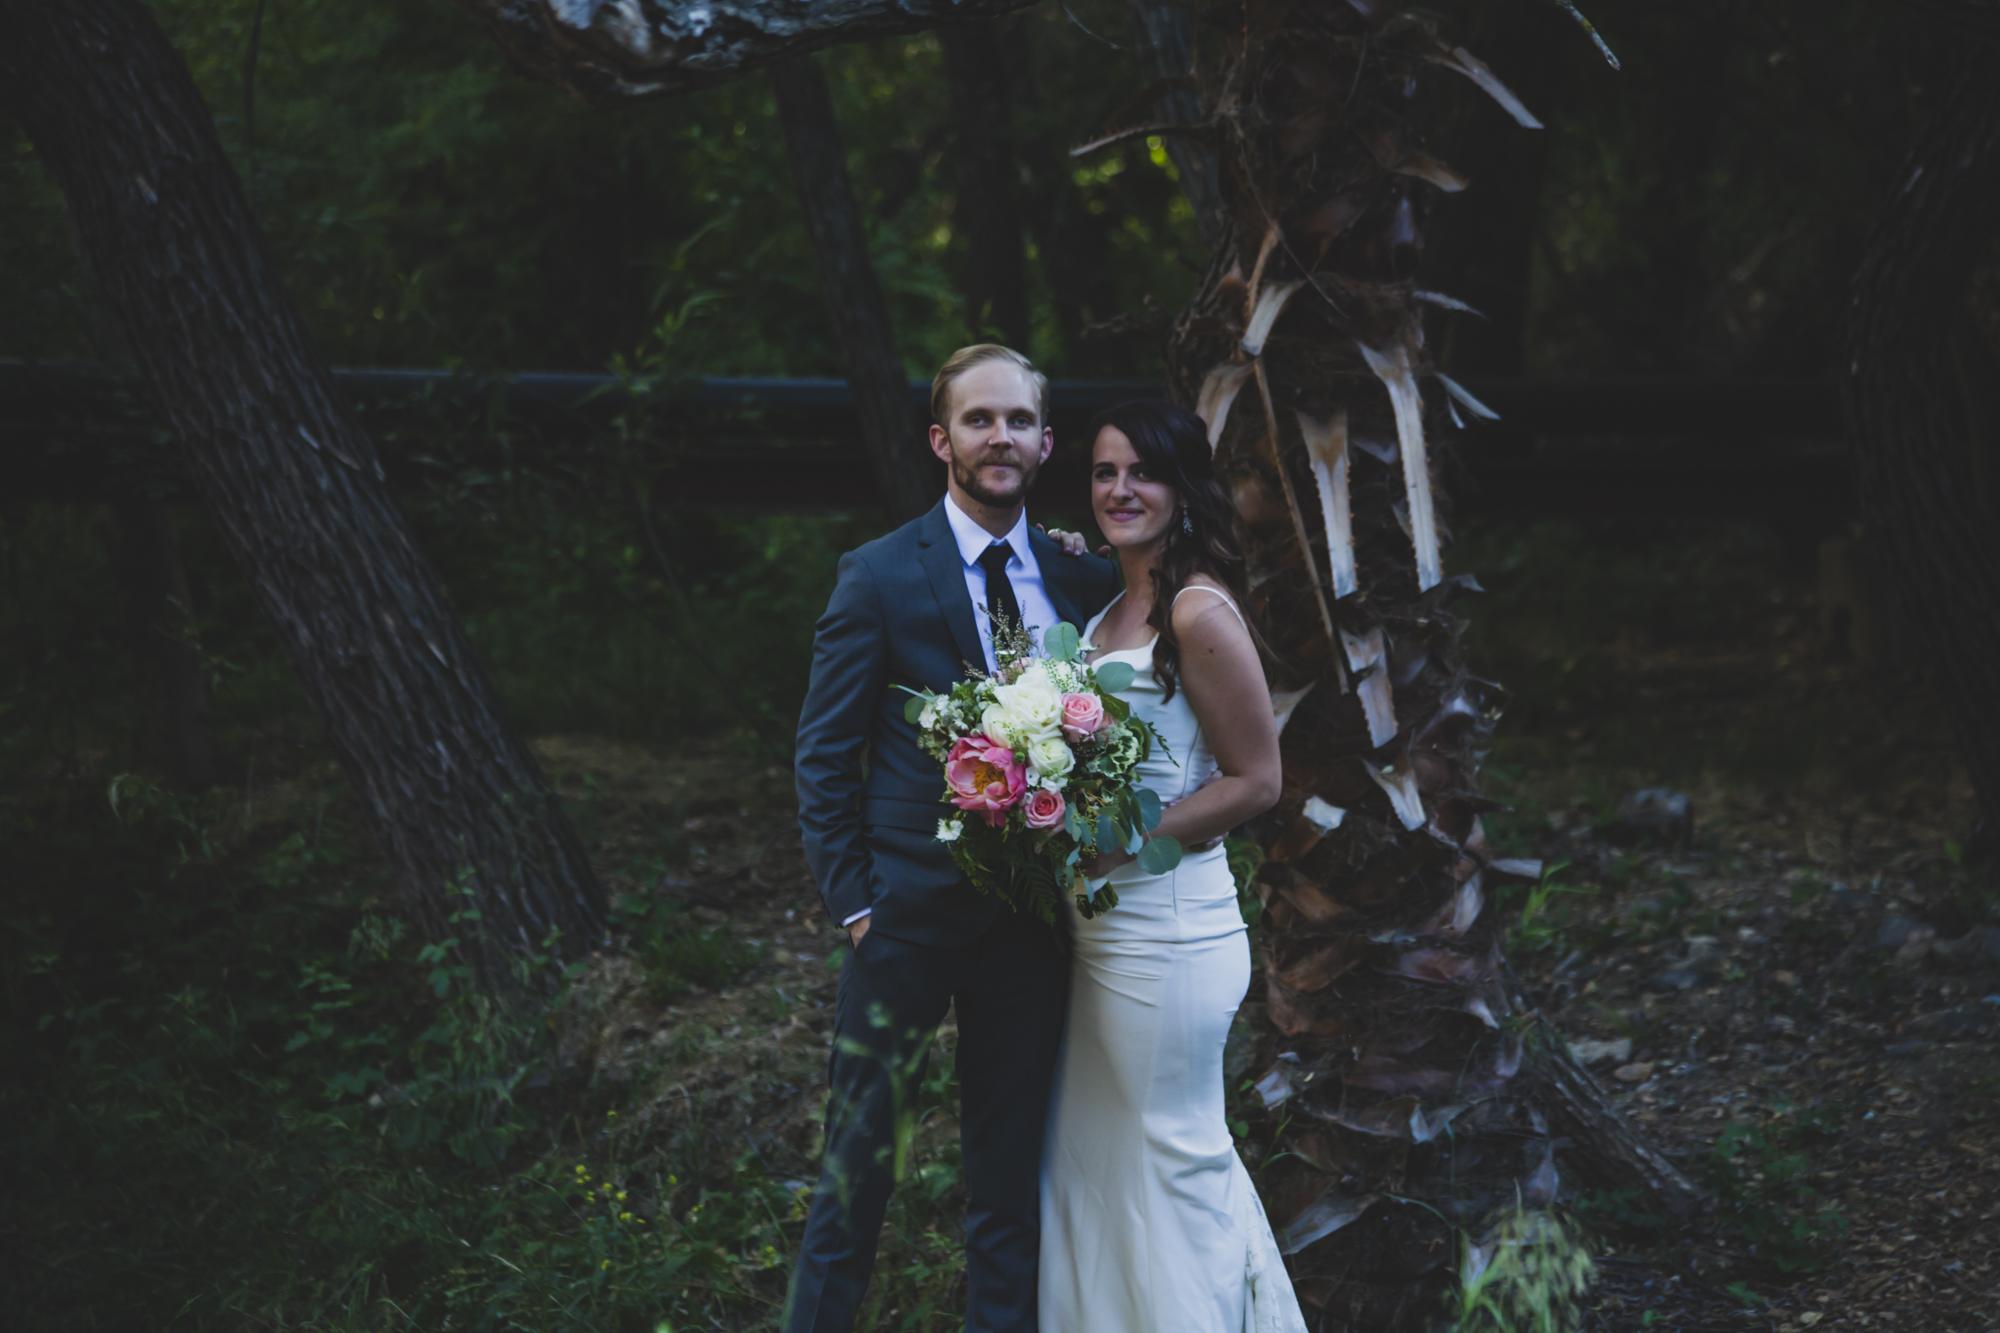 Megan & Scotty    Los Angeles, CA.